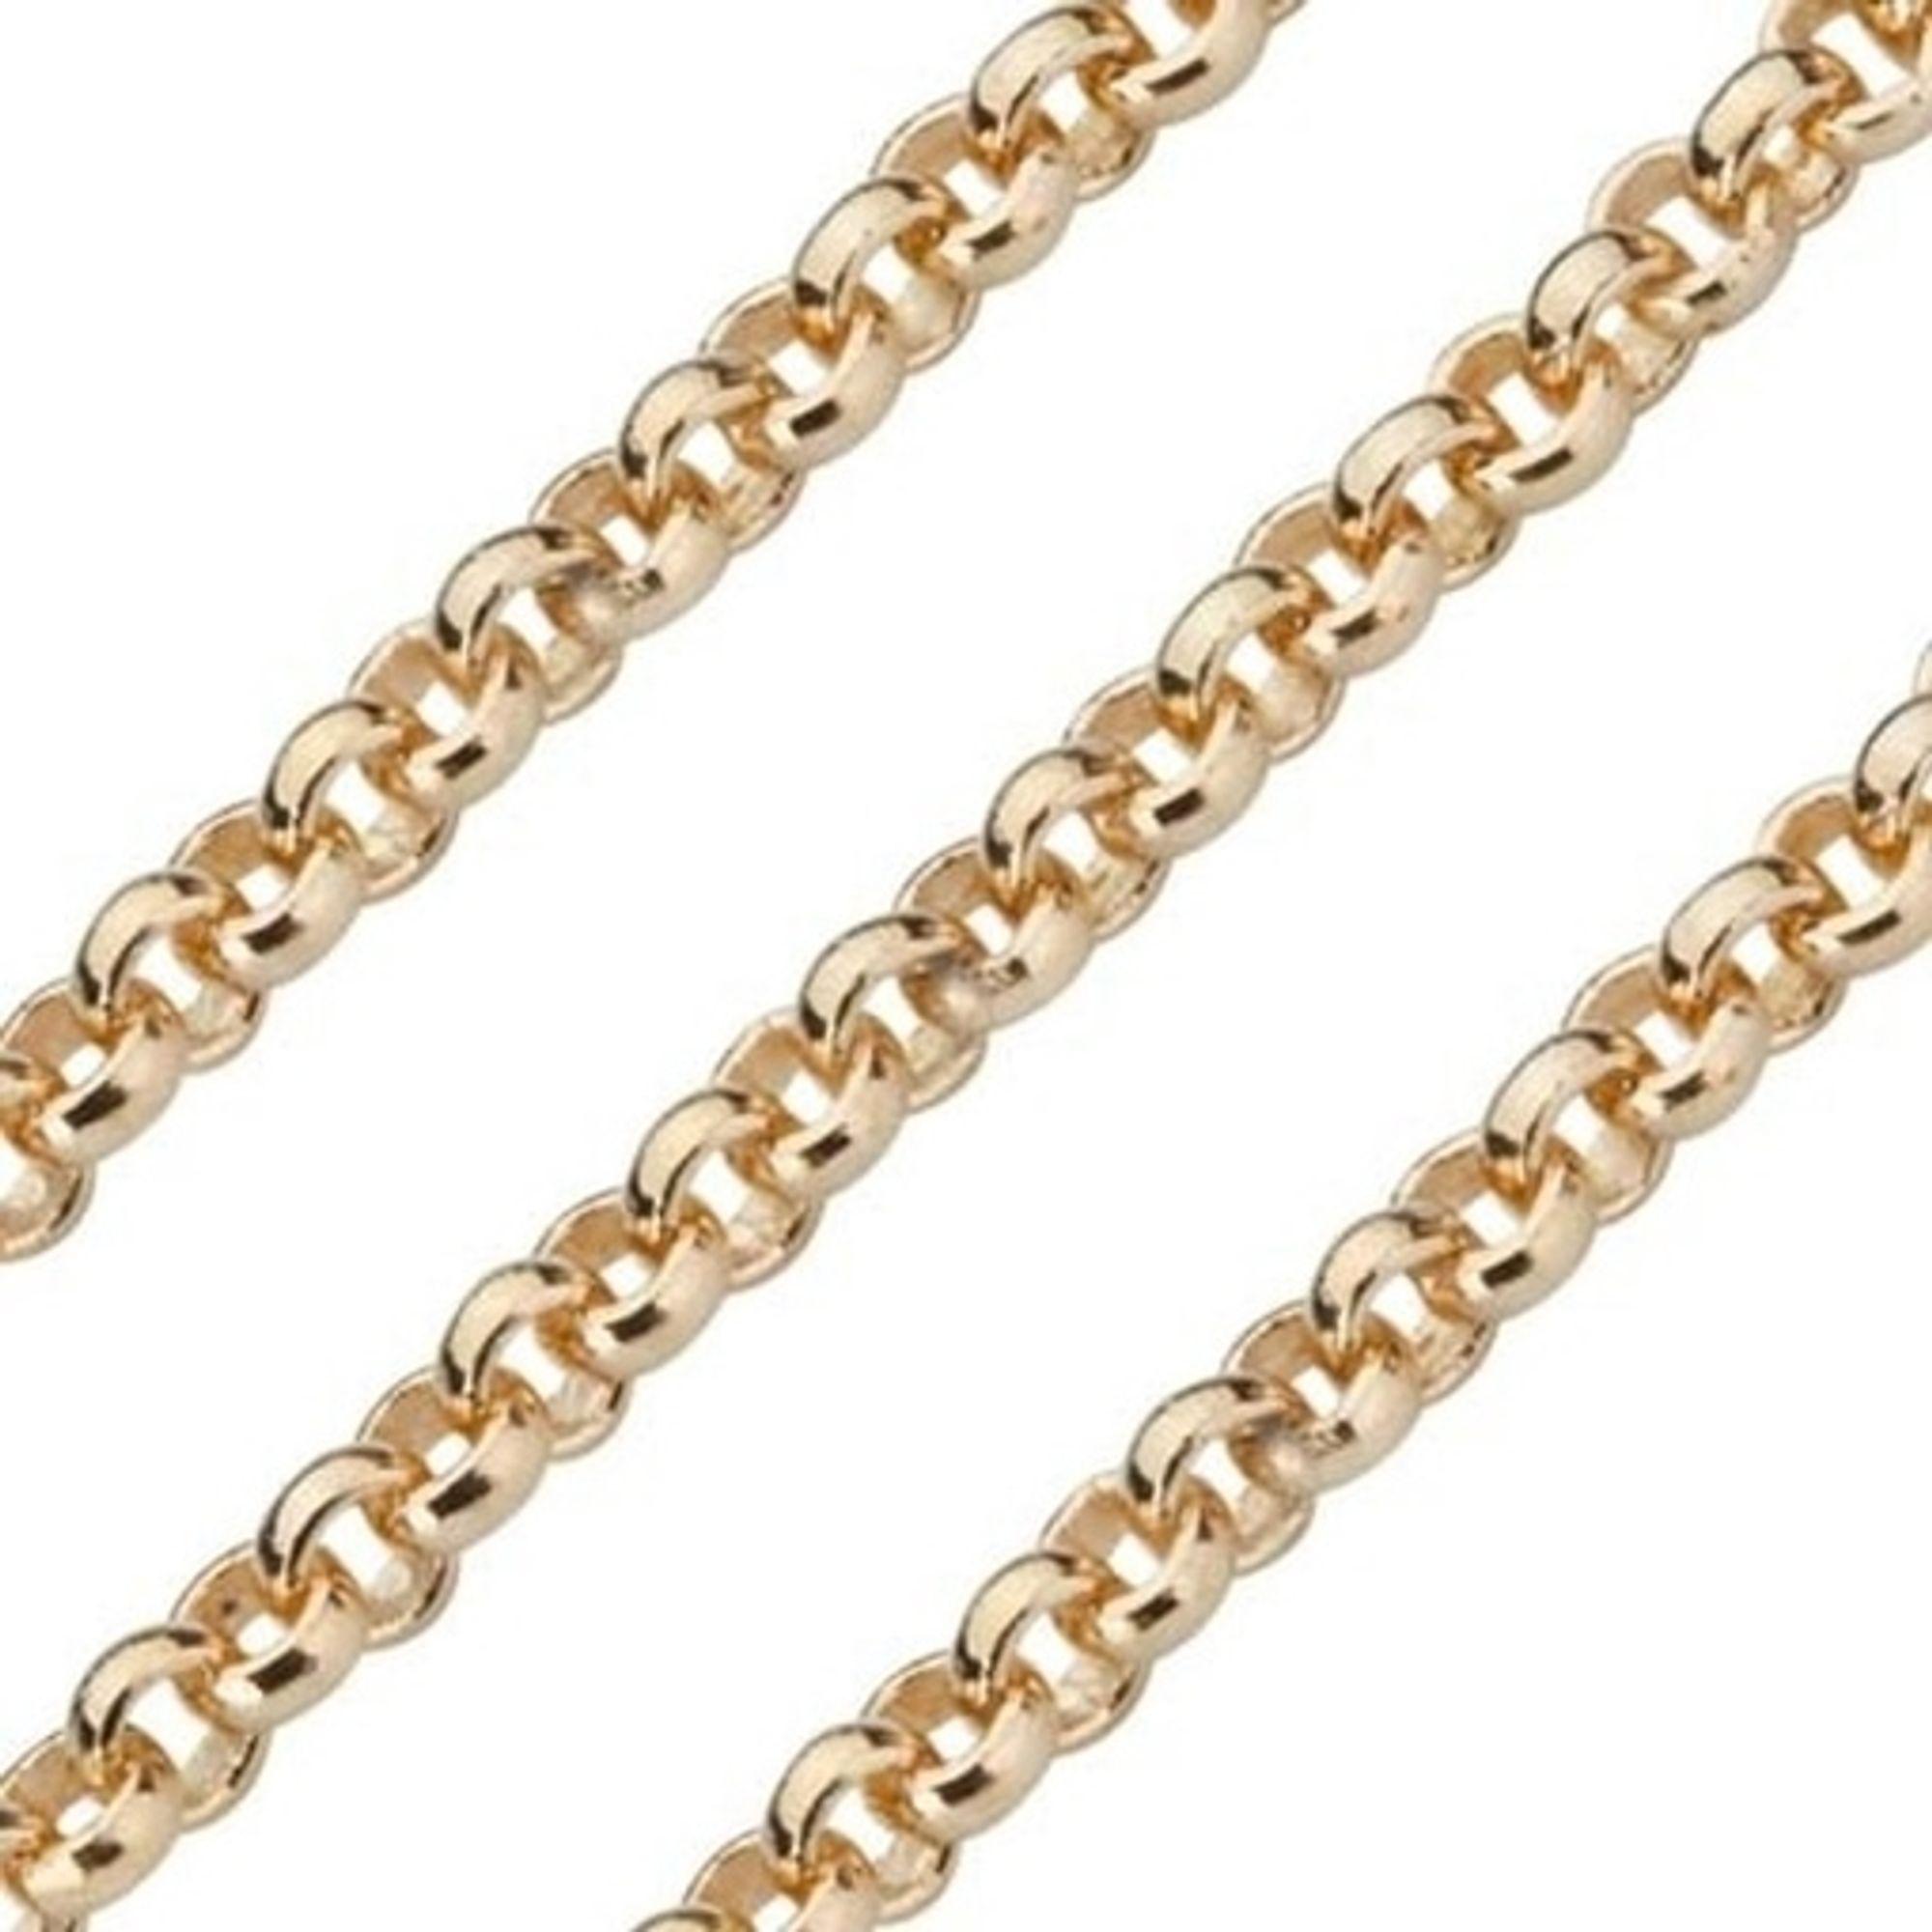 Quoins QK-EG1-45 Kette gold 45 cm